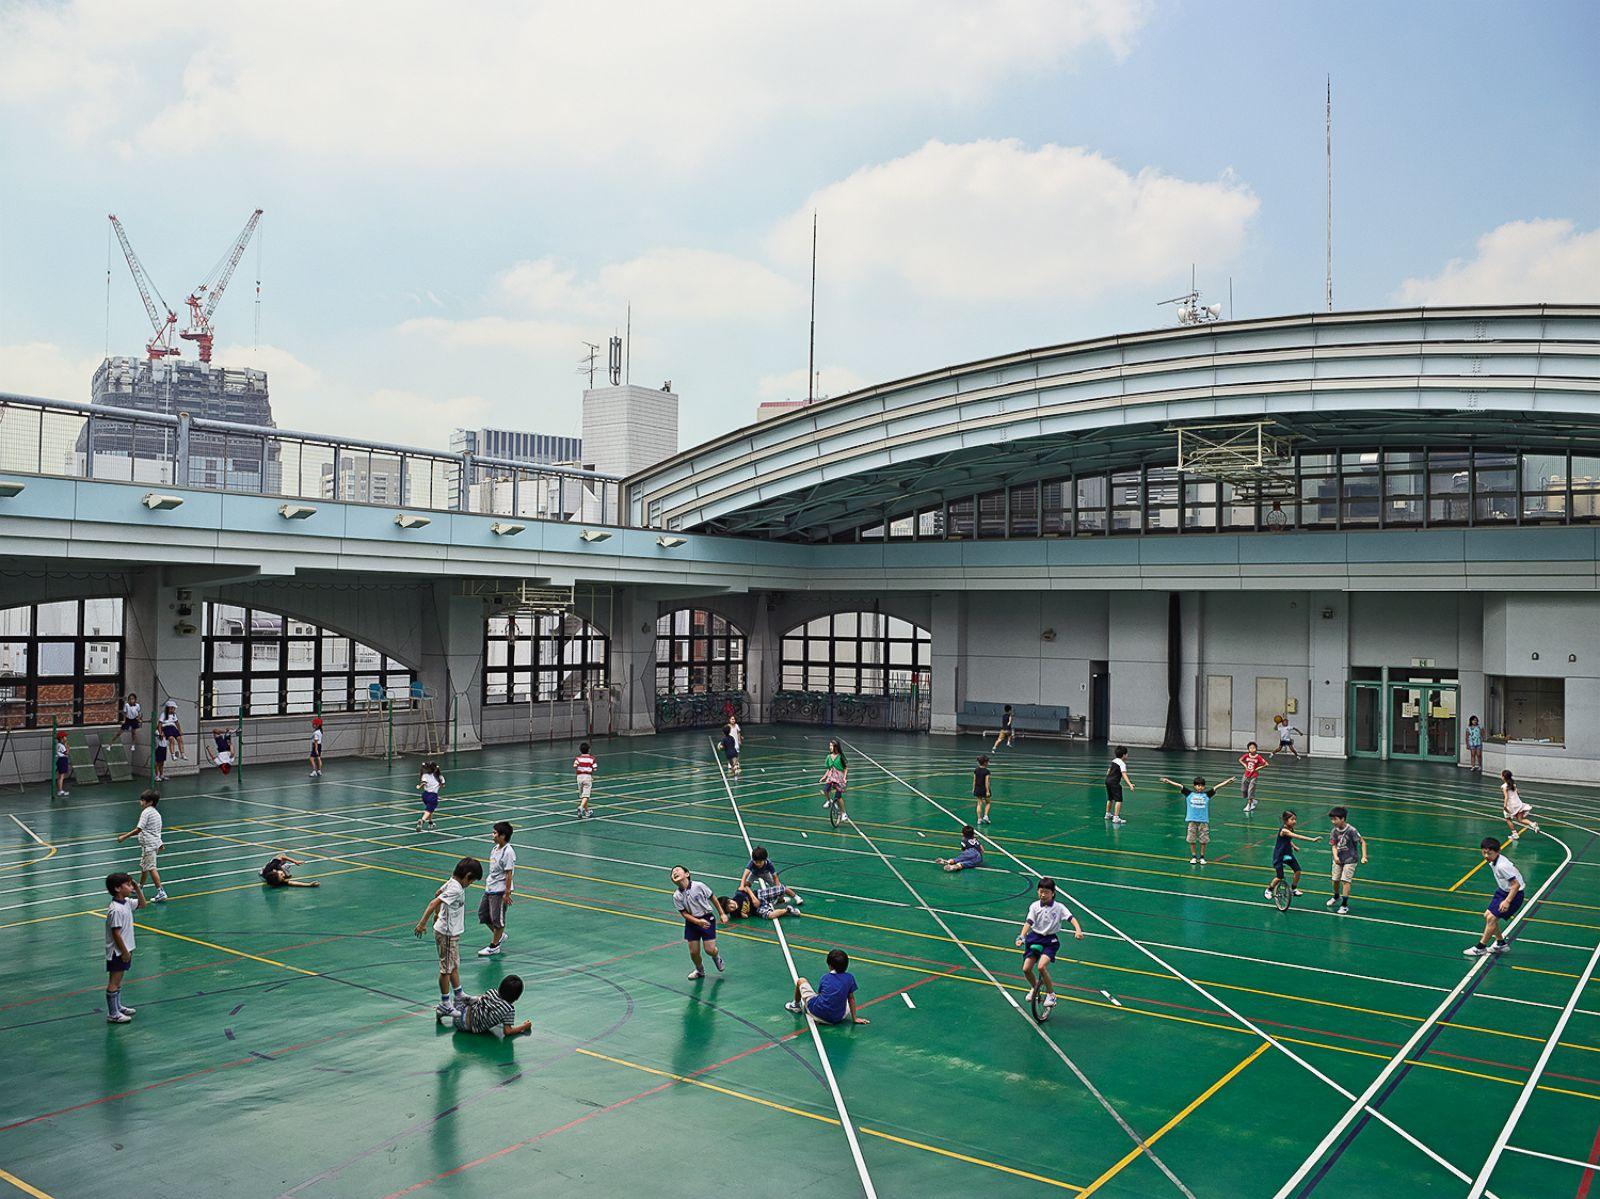 ht_MOLLISON_PLAYGROUND_JAPAN_Shohei_wg_150409_4x3_1600